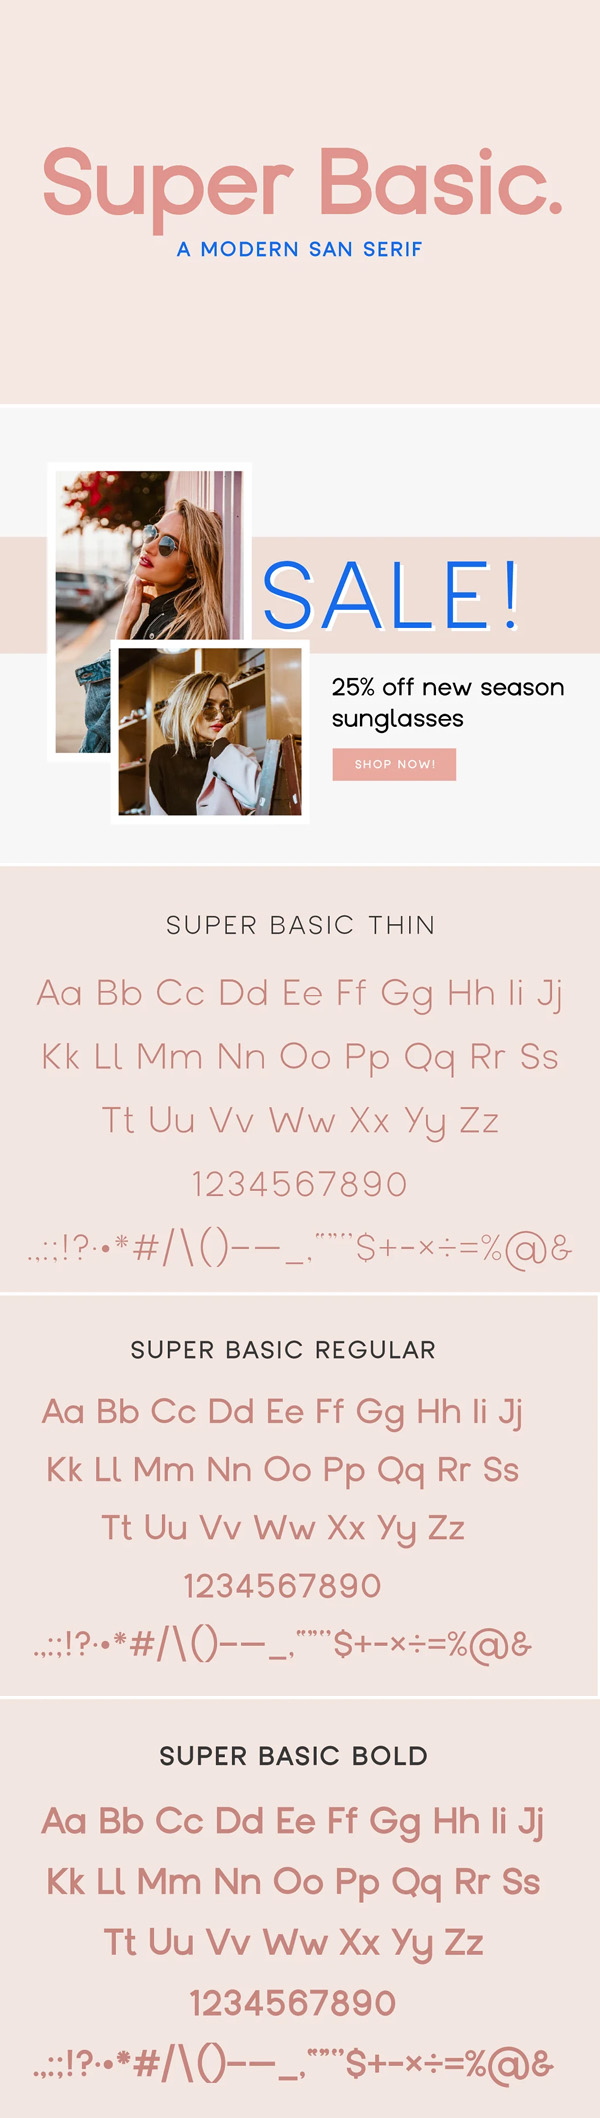 Super Basic - A Modern San Serif Free Font